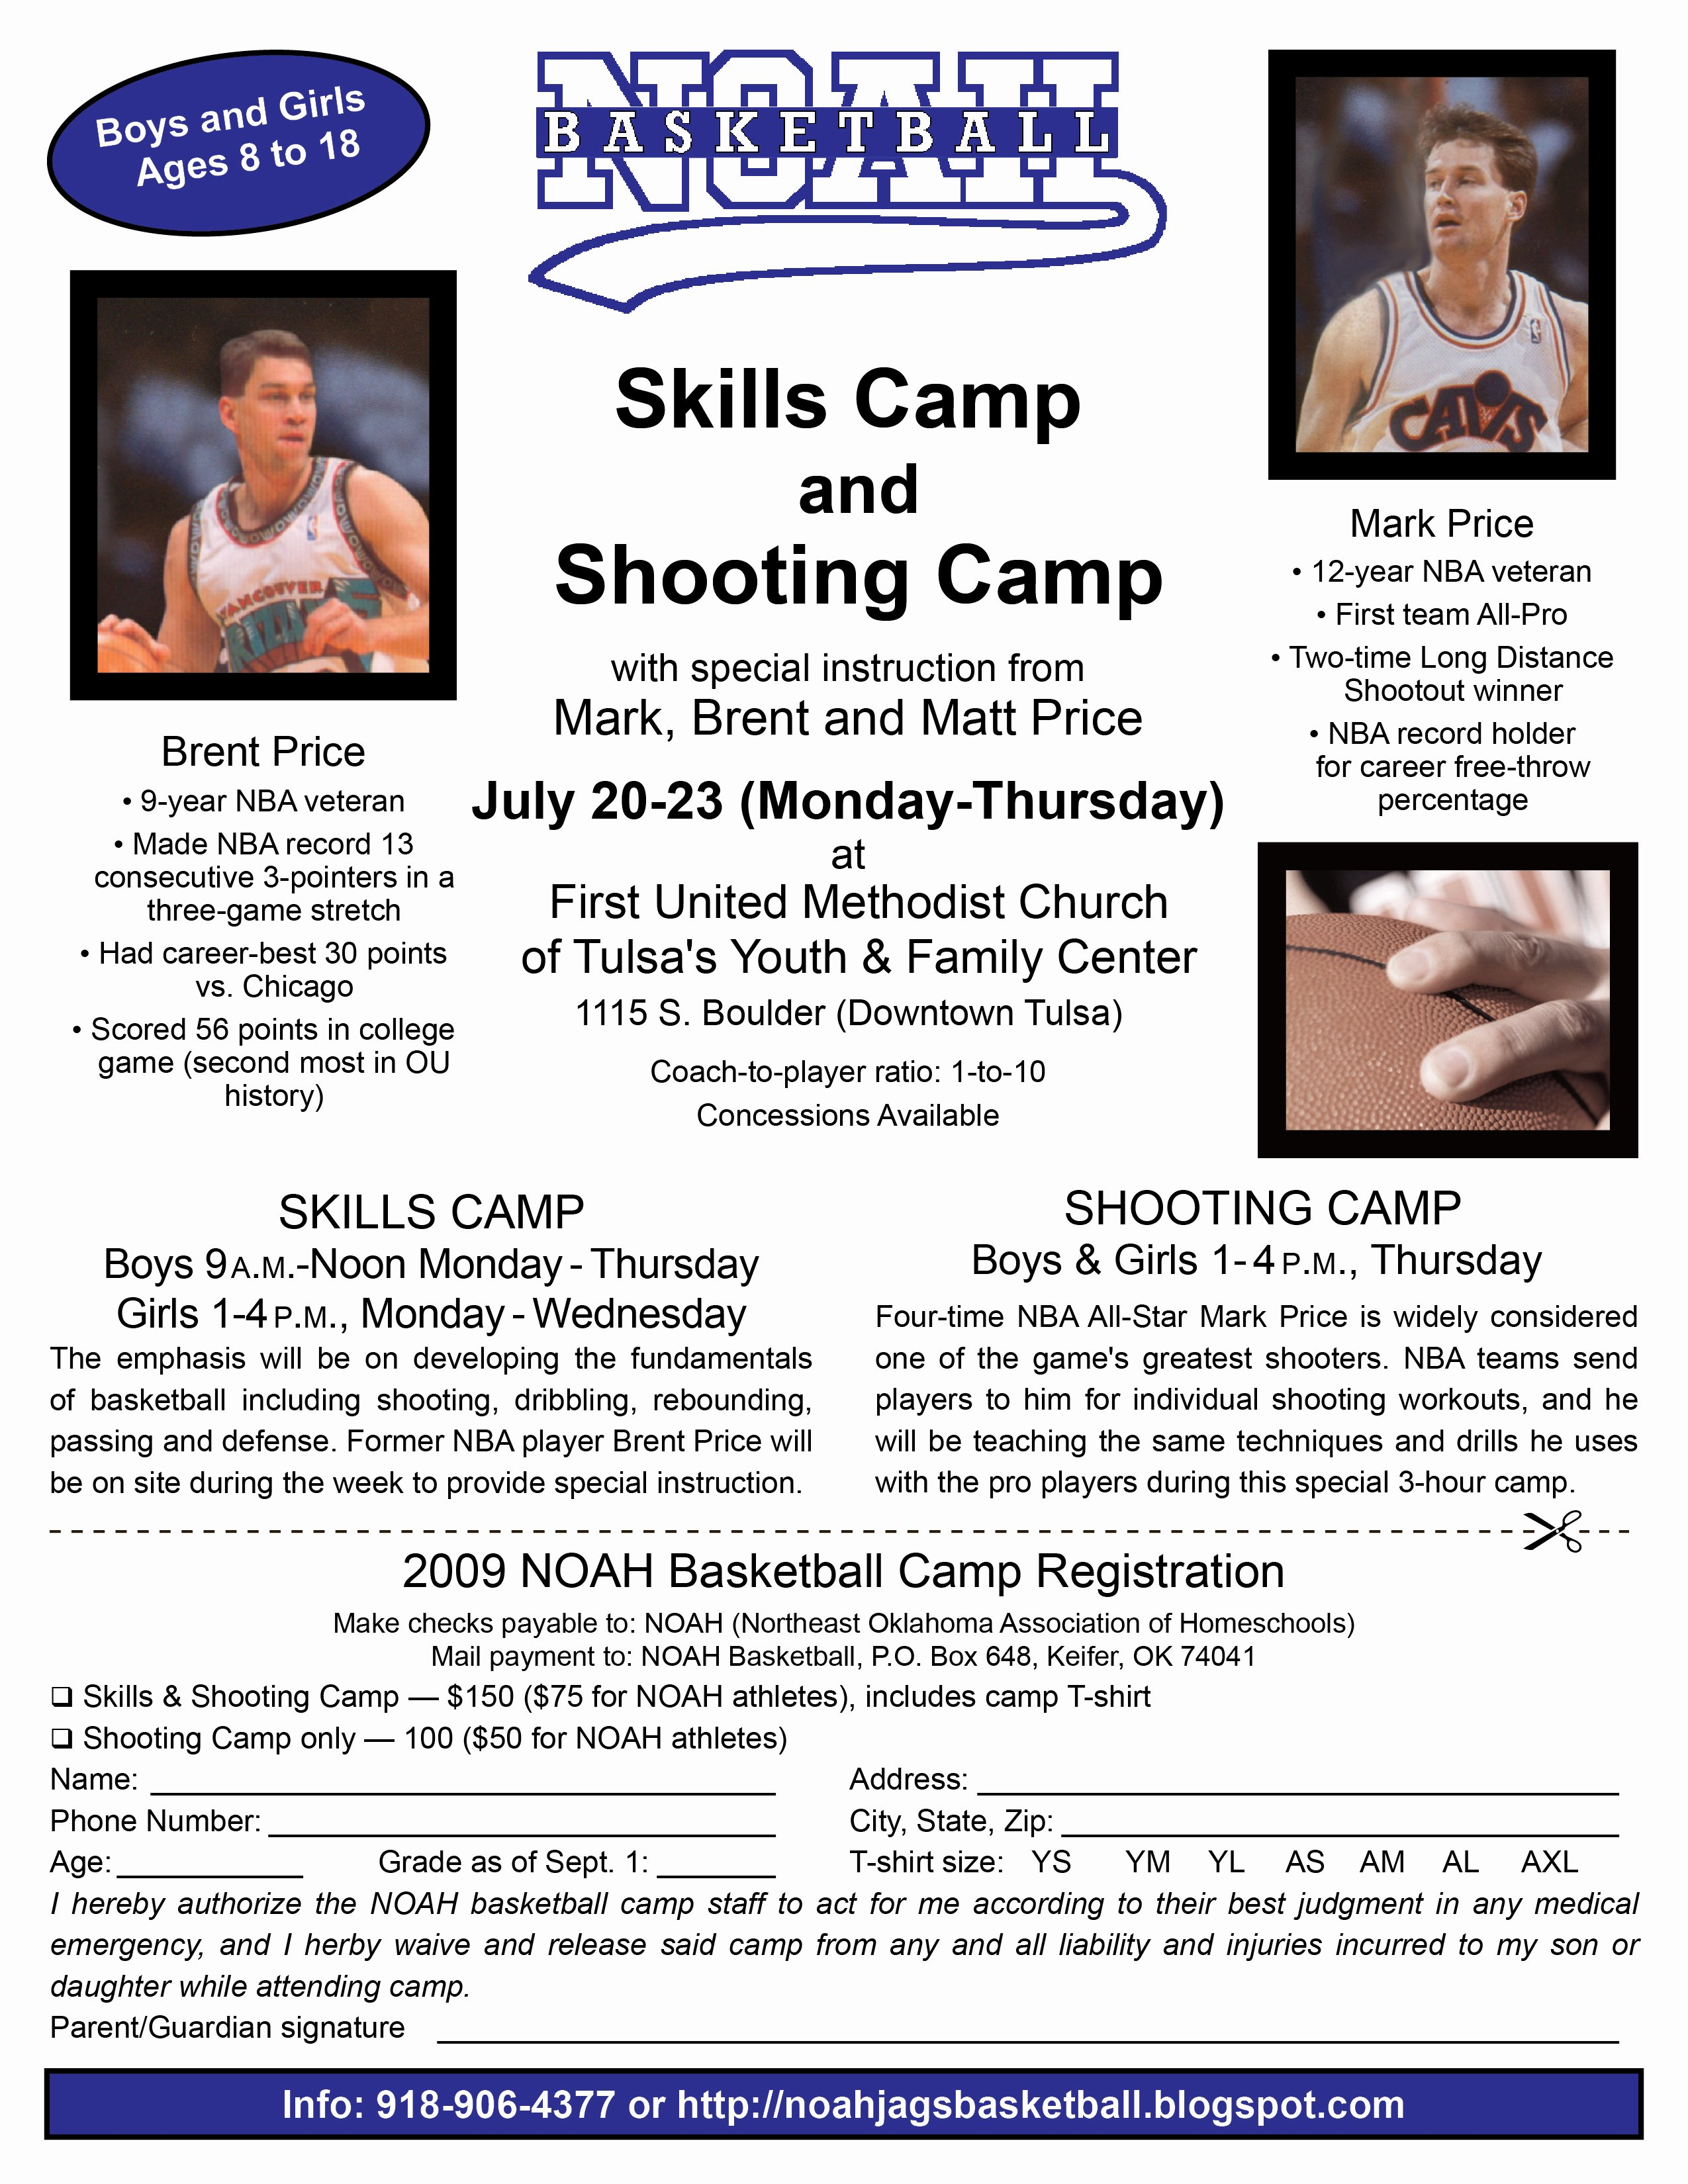 Basketball Camp Flyer Template Awesome Noah Baksetball Camp Flyer – Rfdesign08